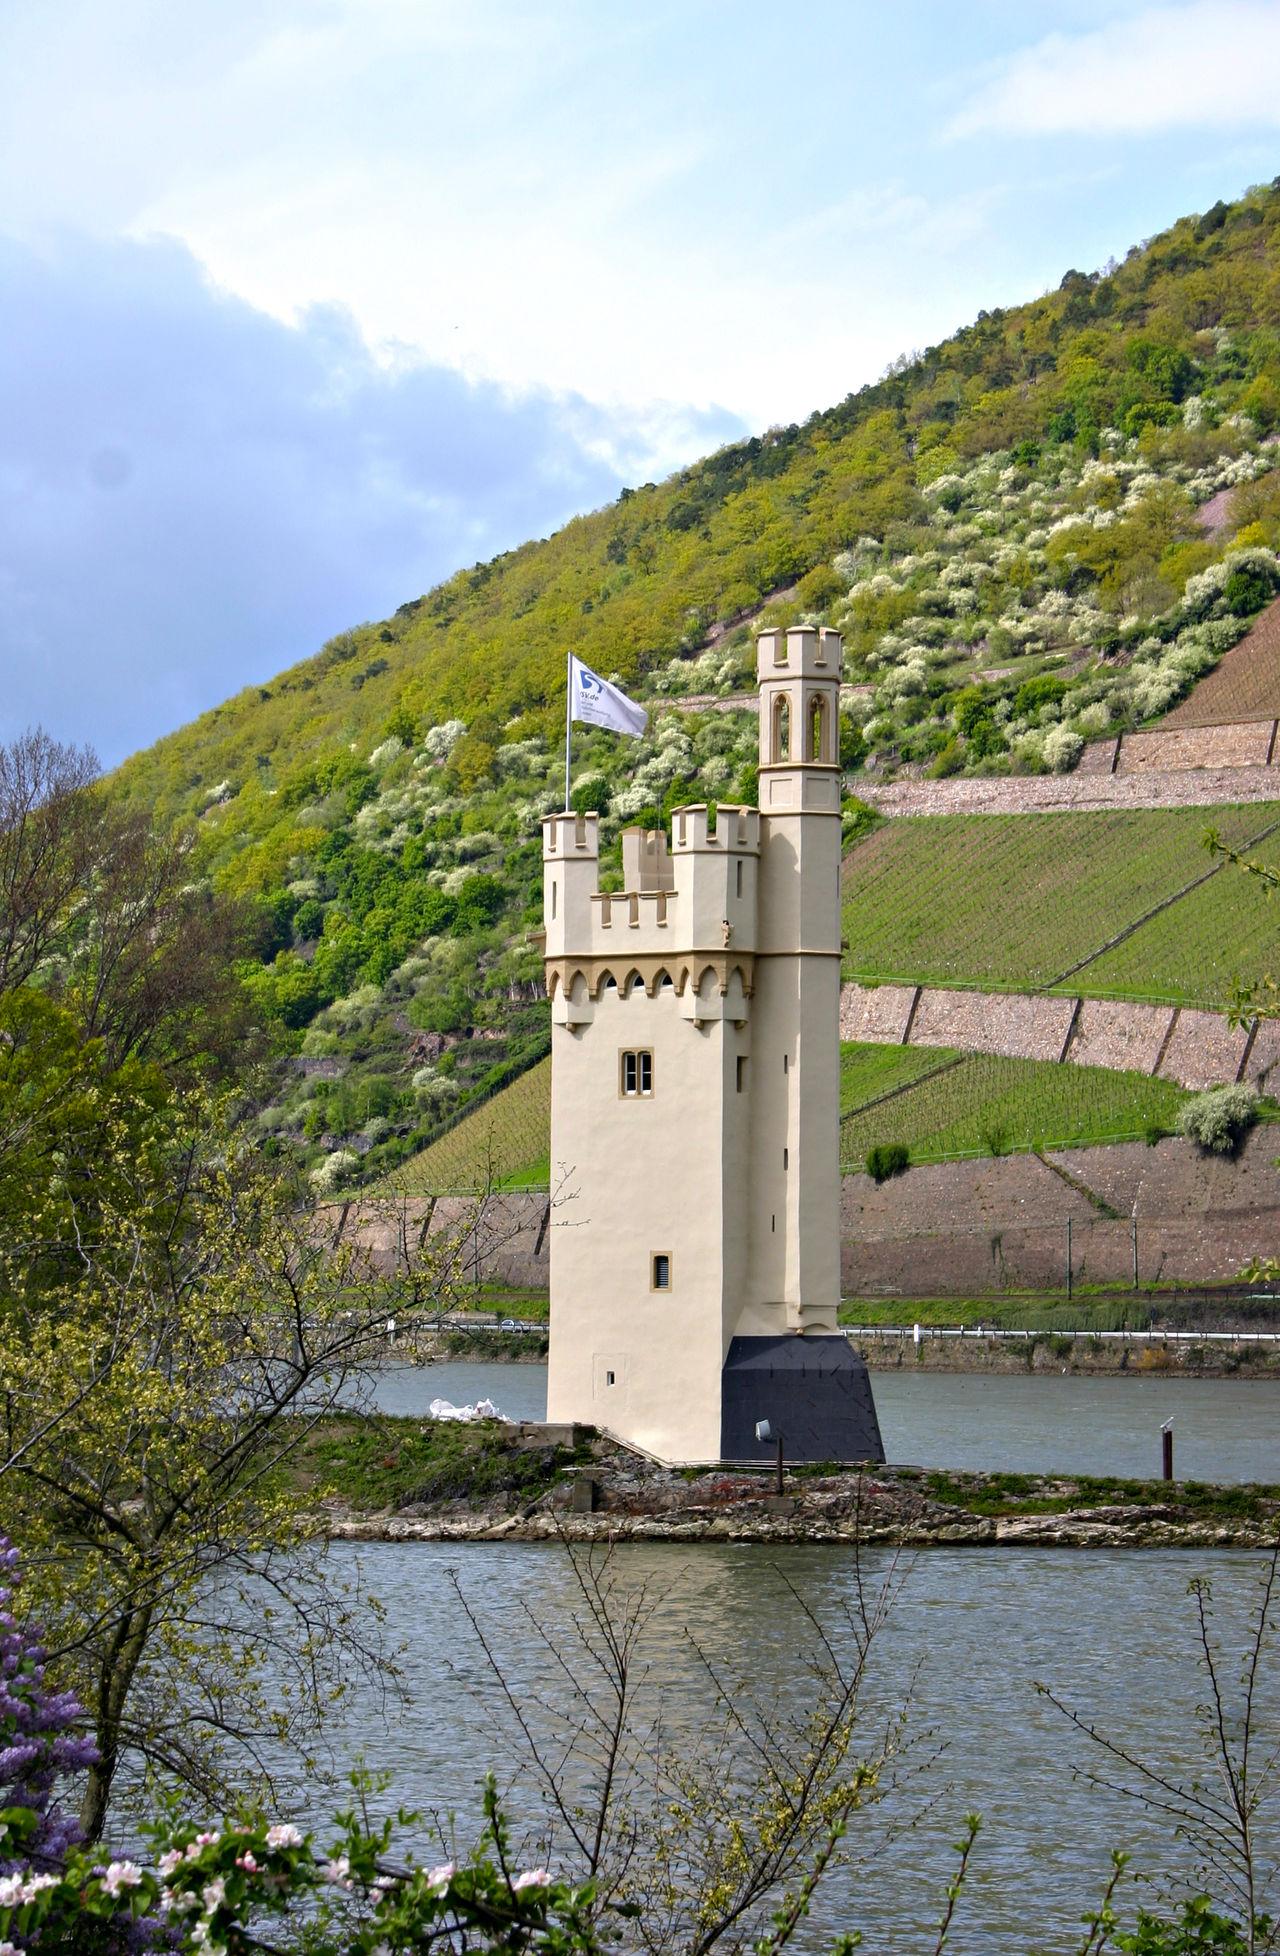 Binger Mäuseturm Rheintal